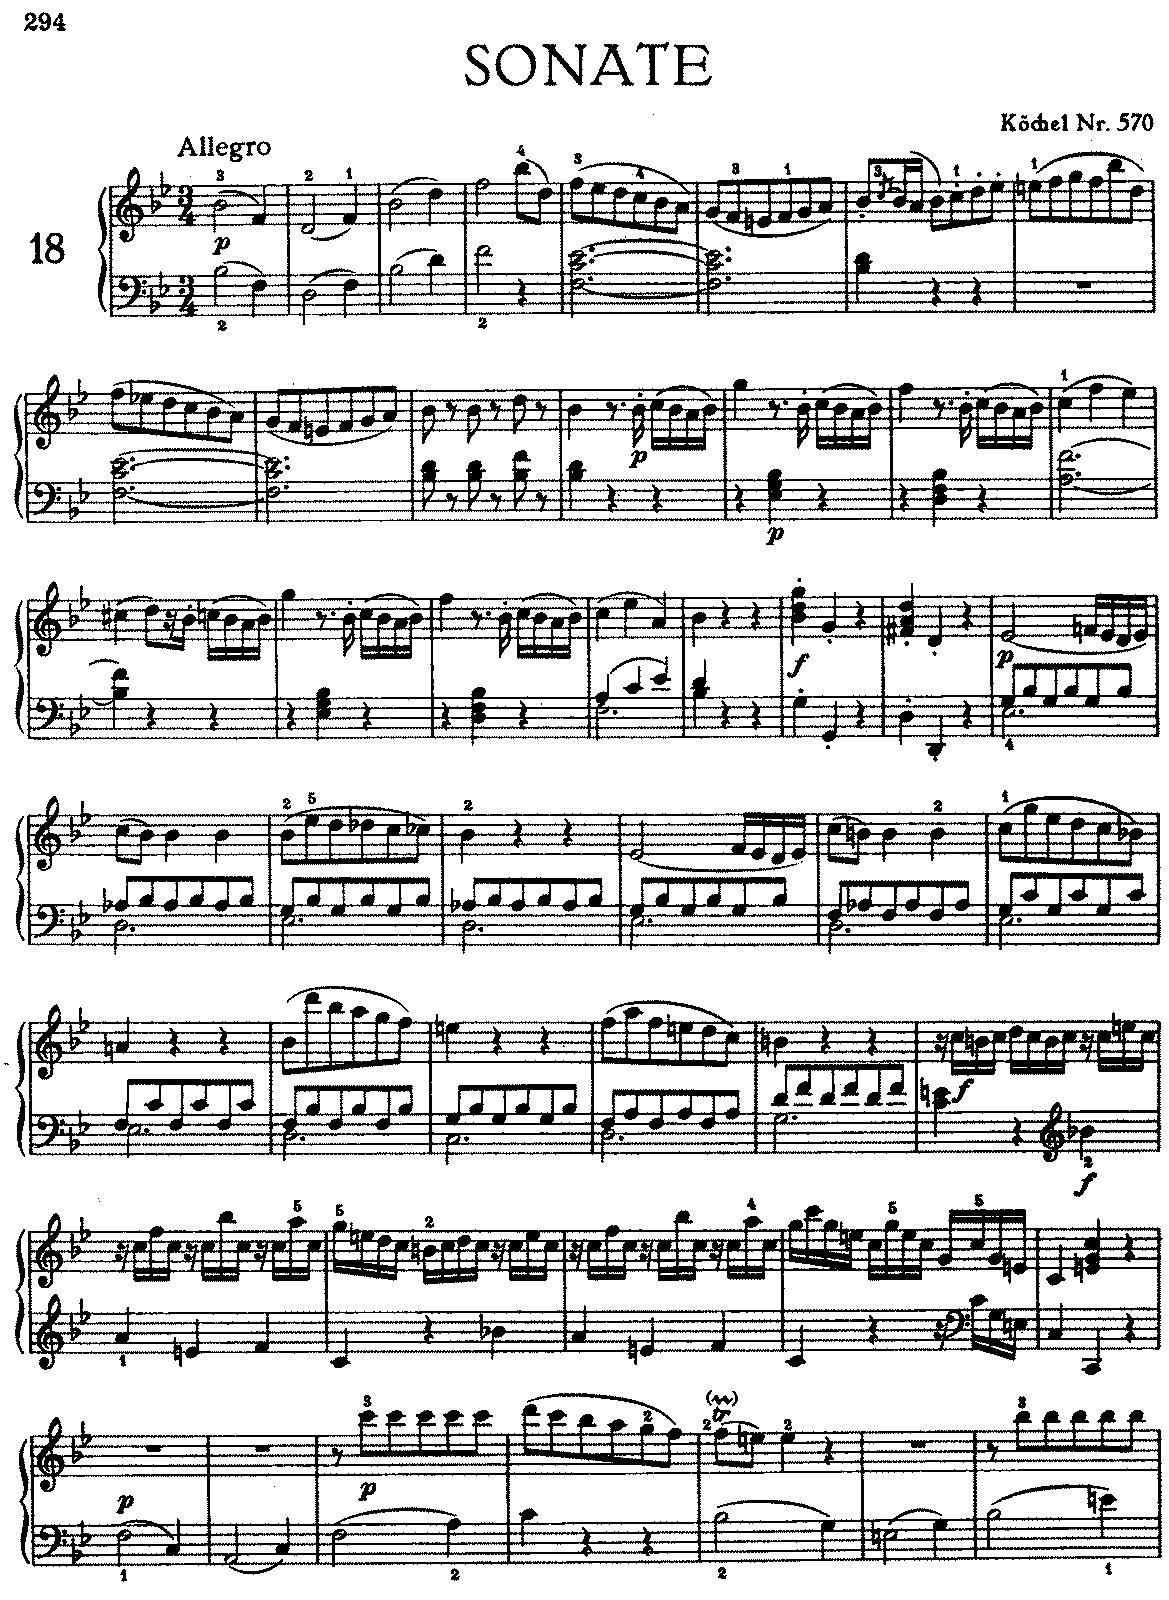 mozart sonata in b flat major k 570